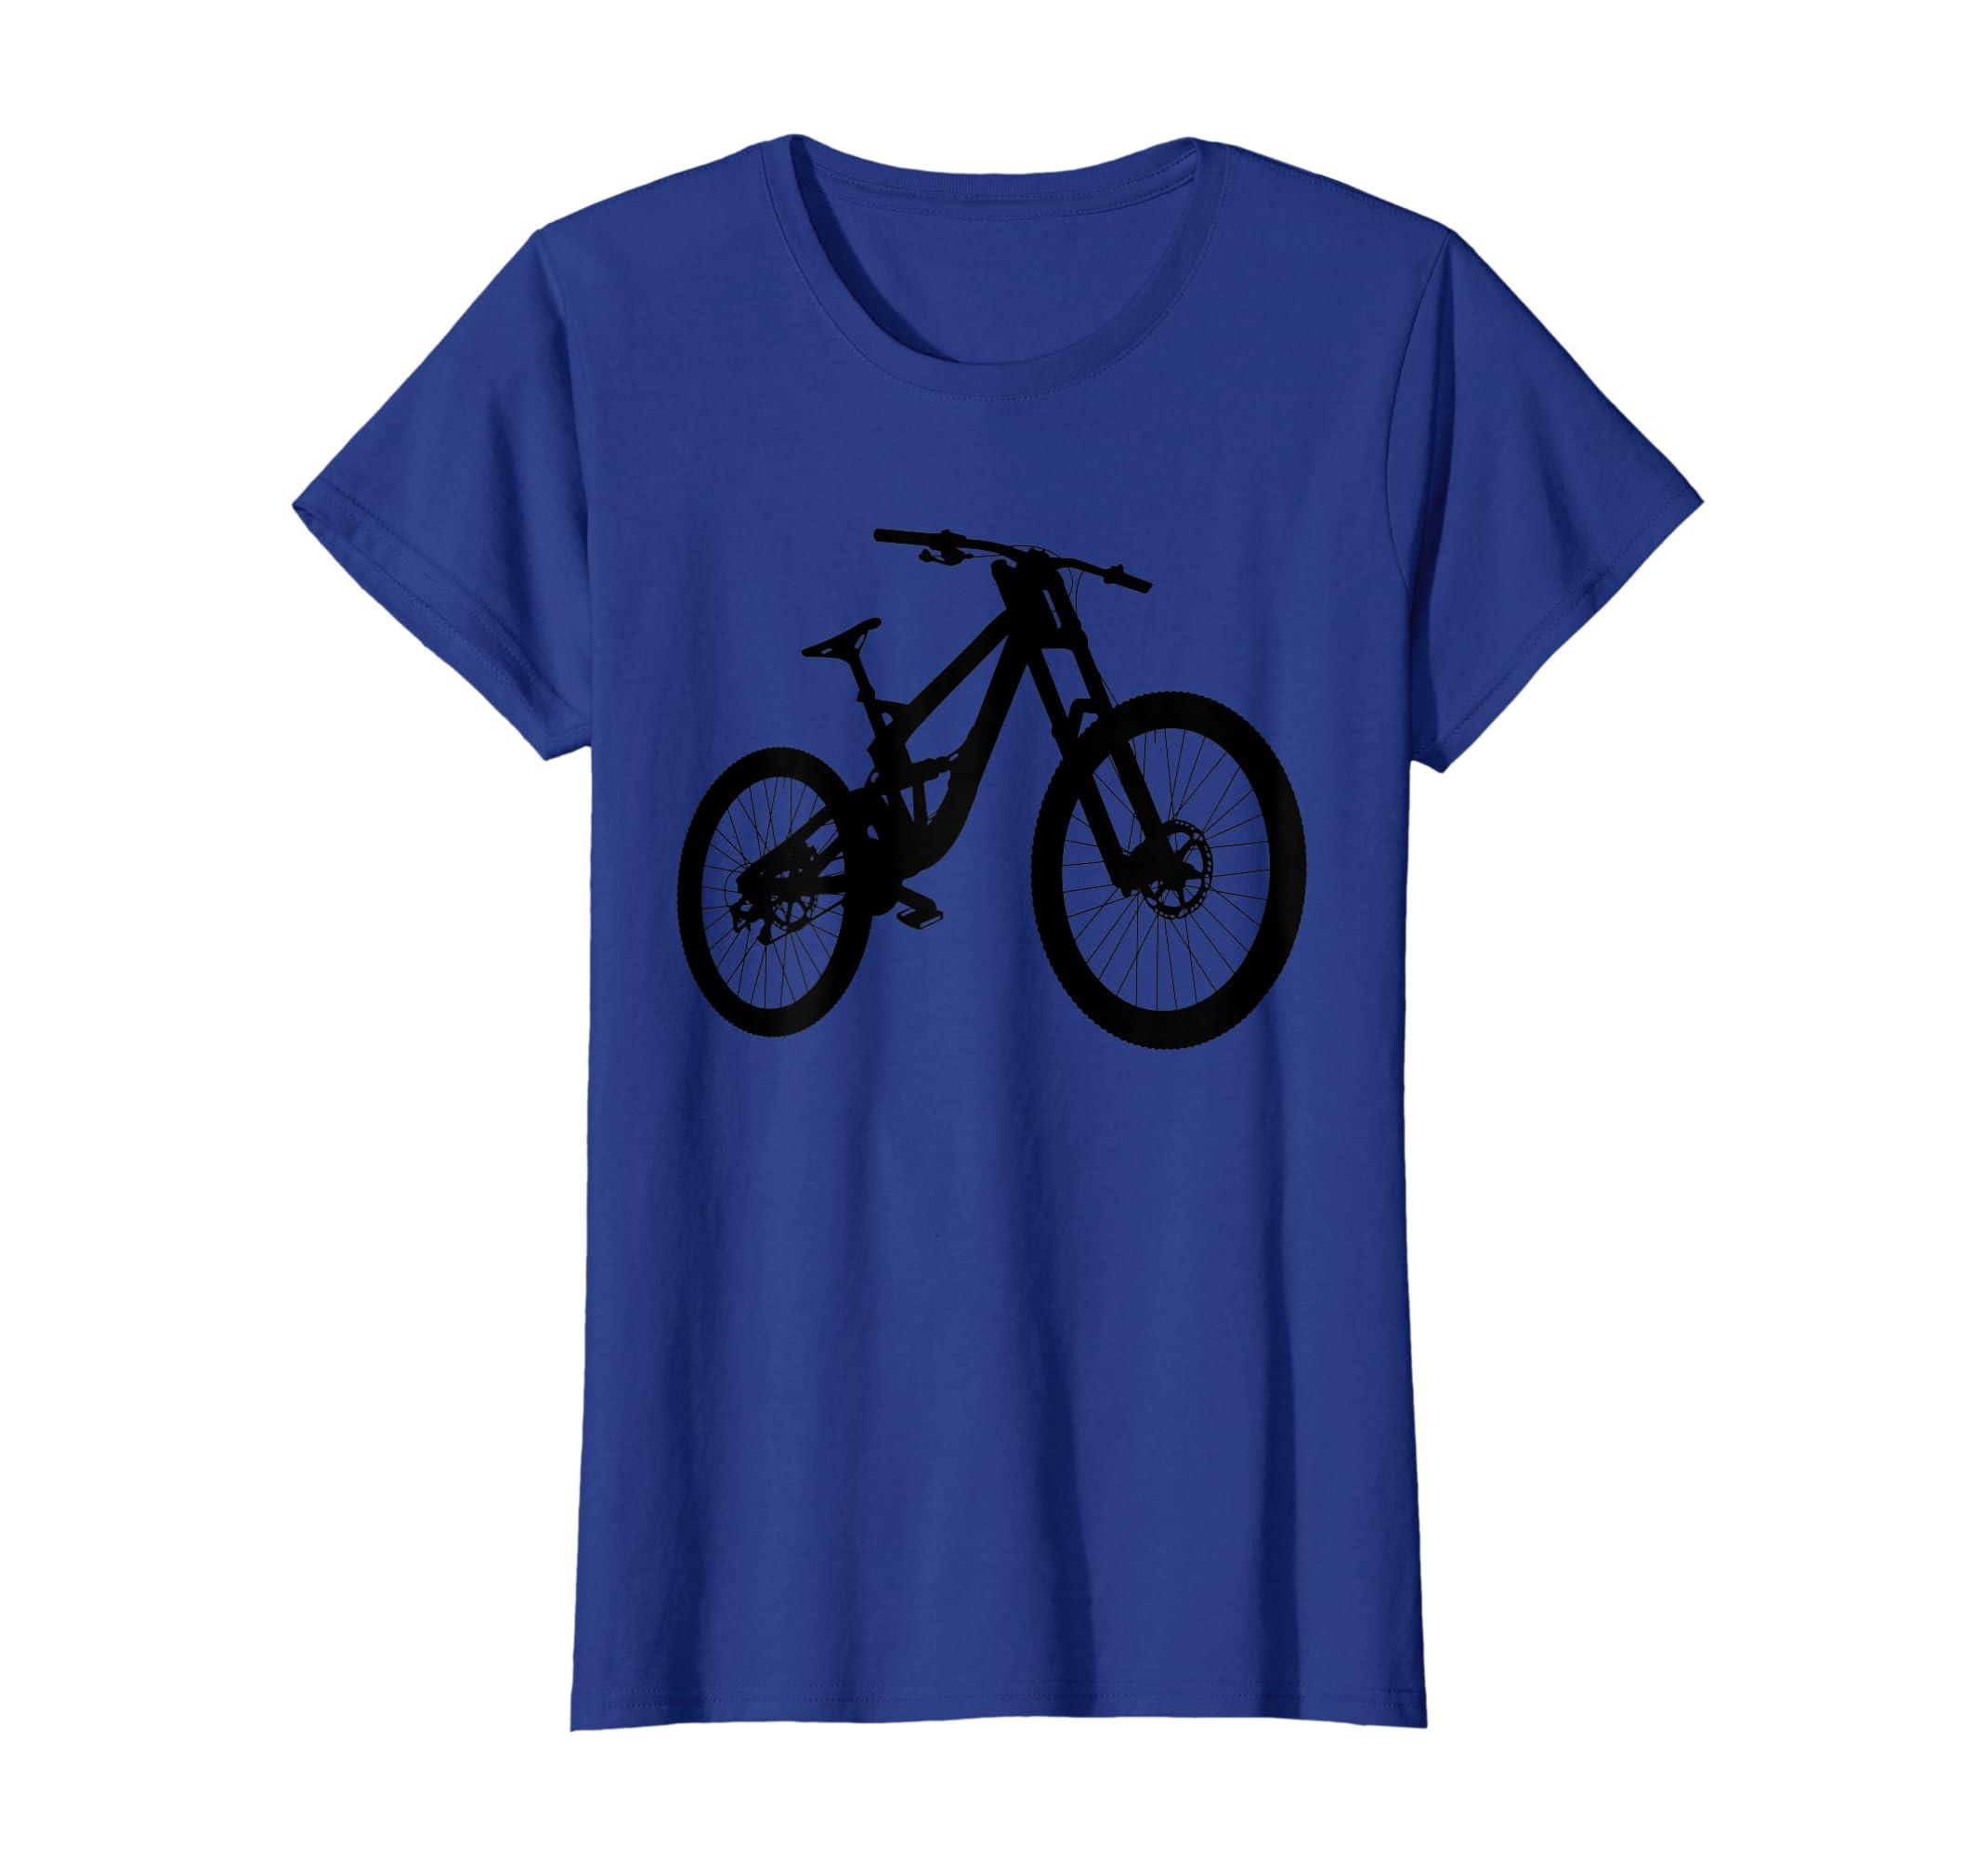 35eea2d9 Amazon.com: Downhill MTB Shirt - DH Freeride Mountain Bike T Shirts:  Clothing